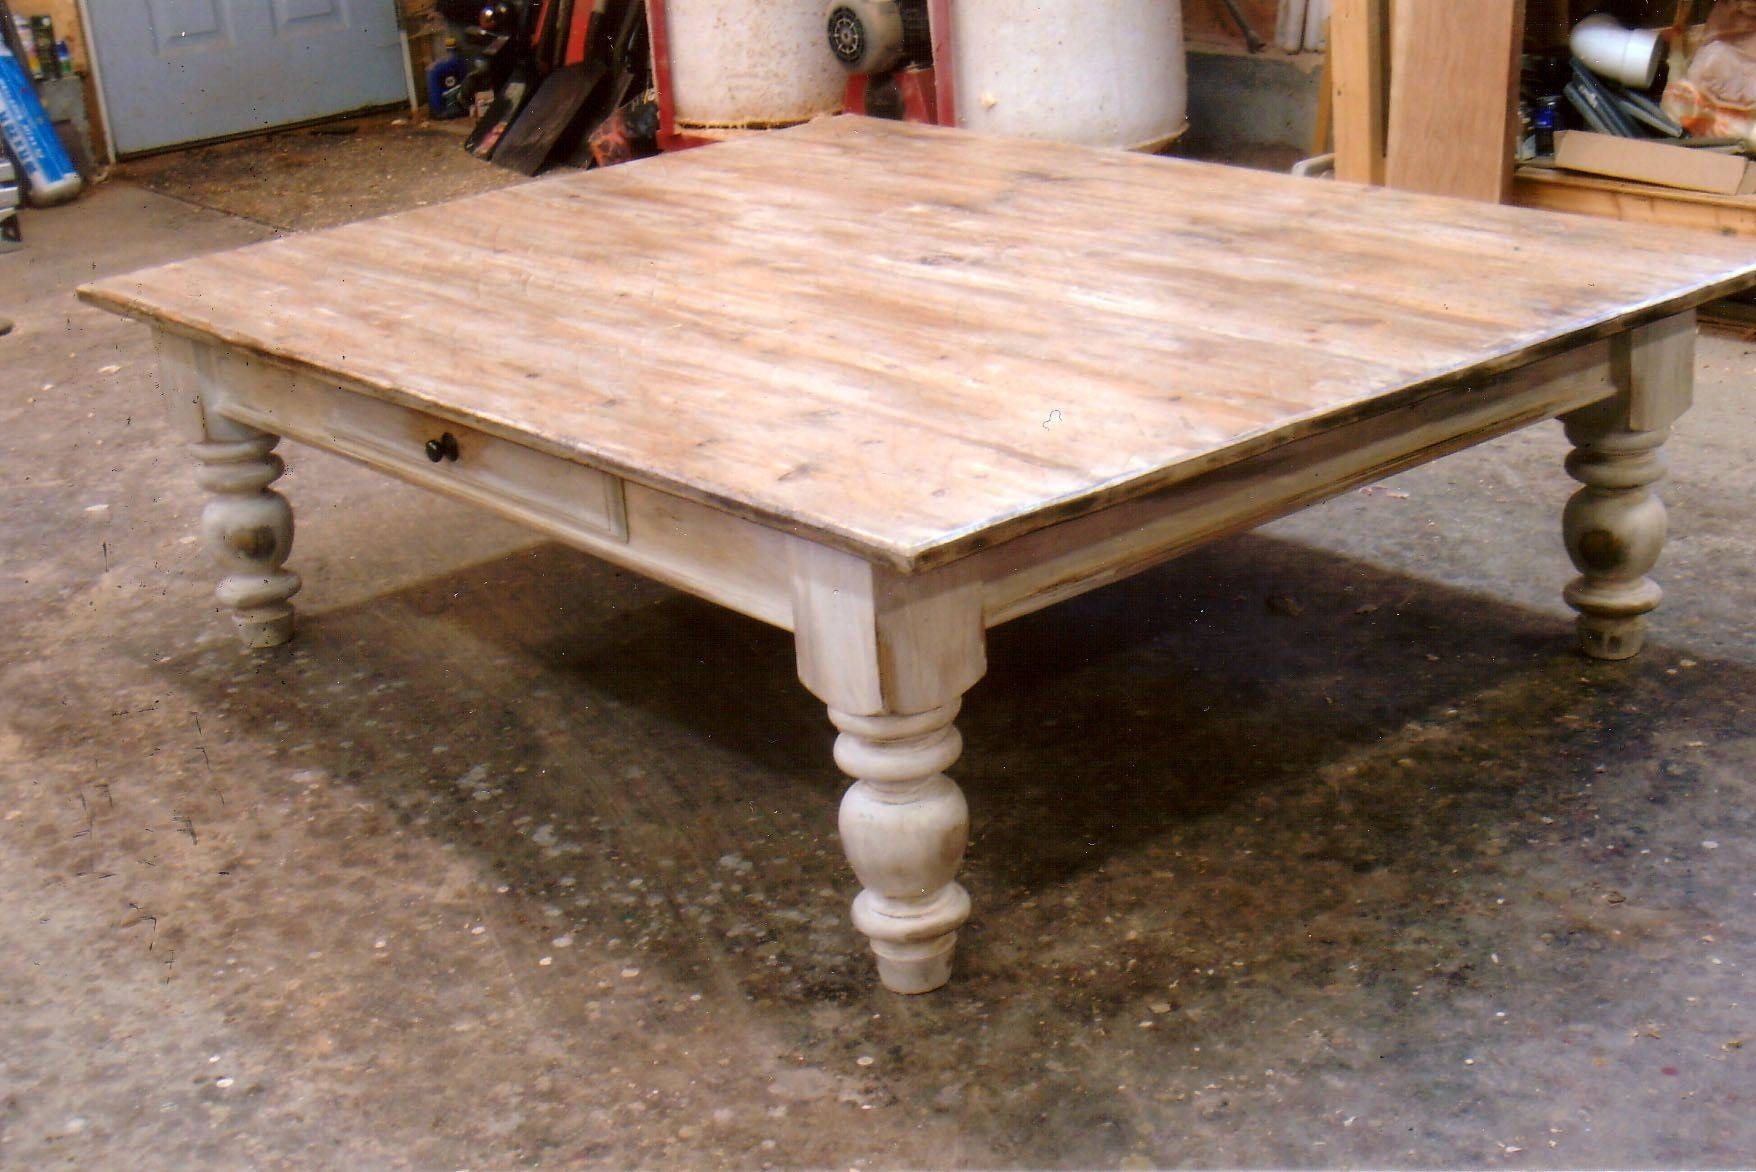 Big Square Coffee Table | Coffee Tables Decoration in Big Square Coffee Tables (Image 8 of 30)